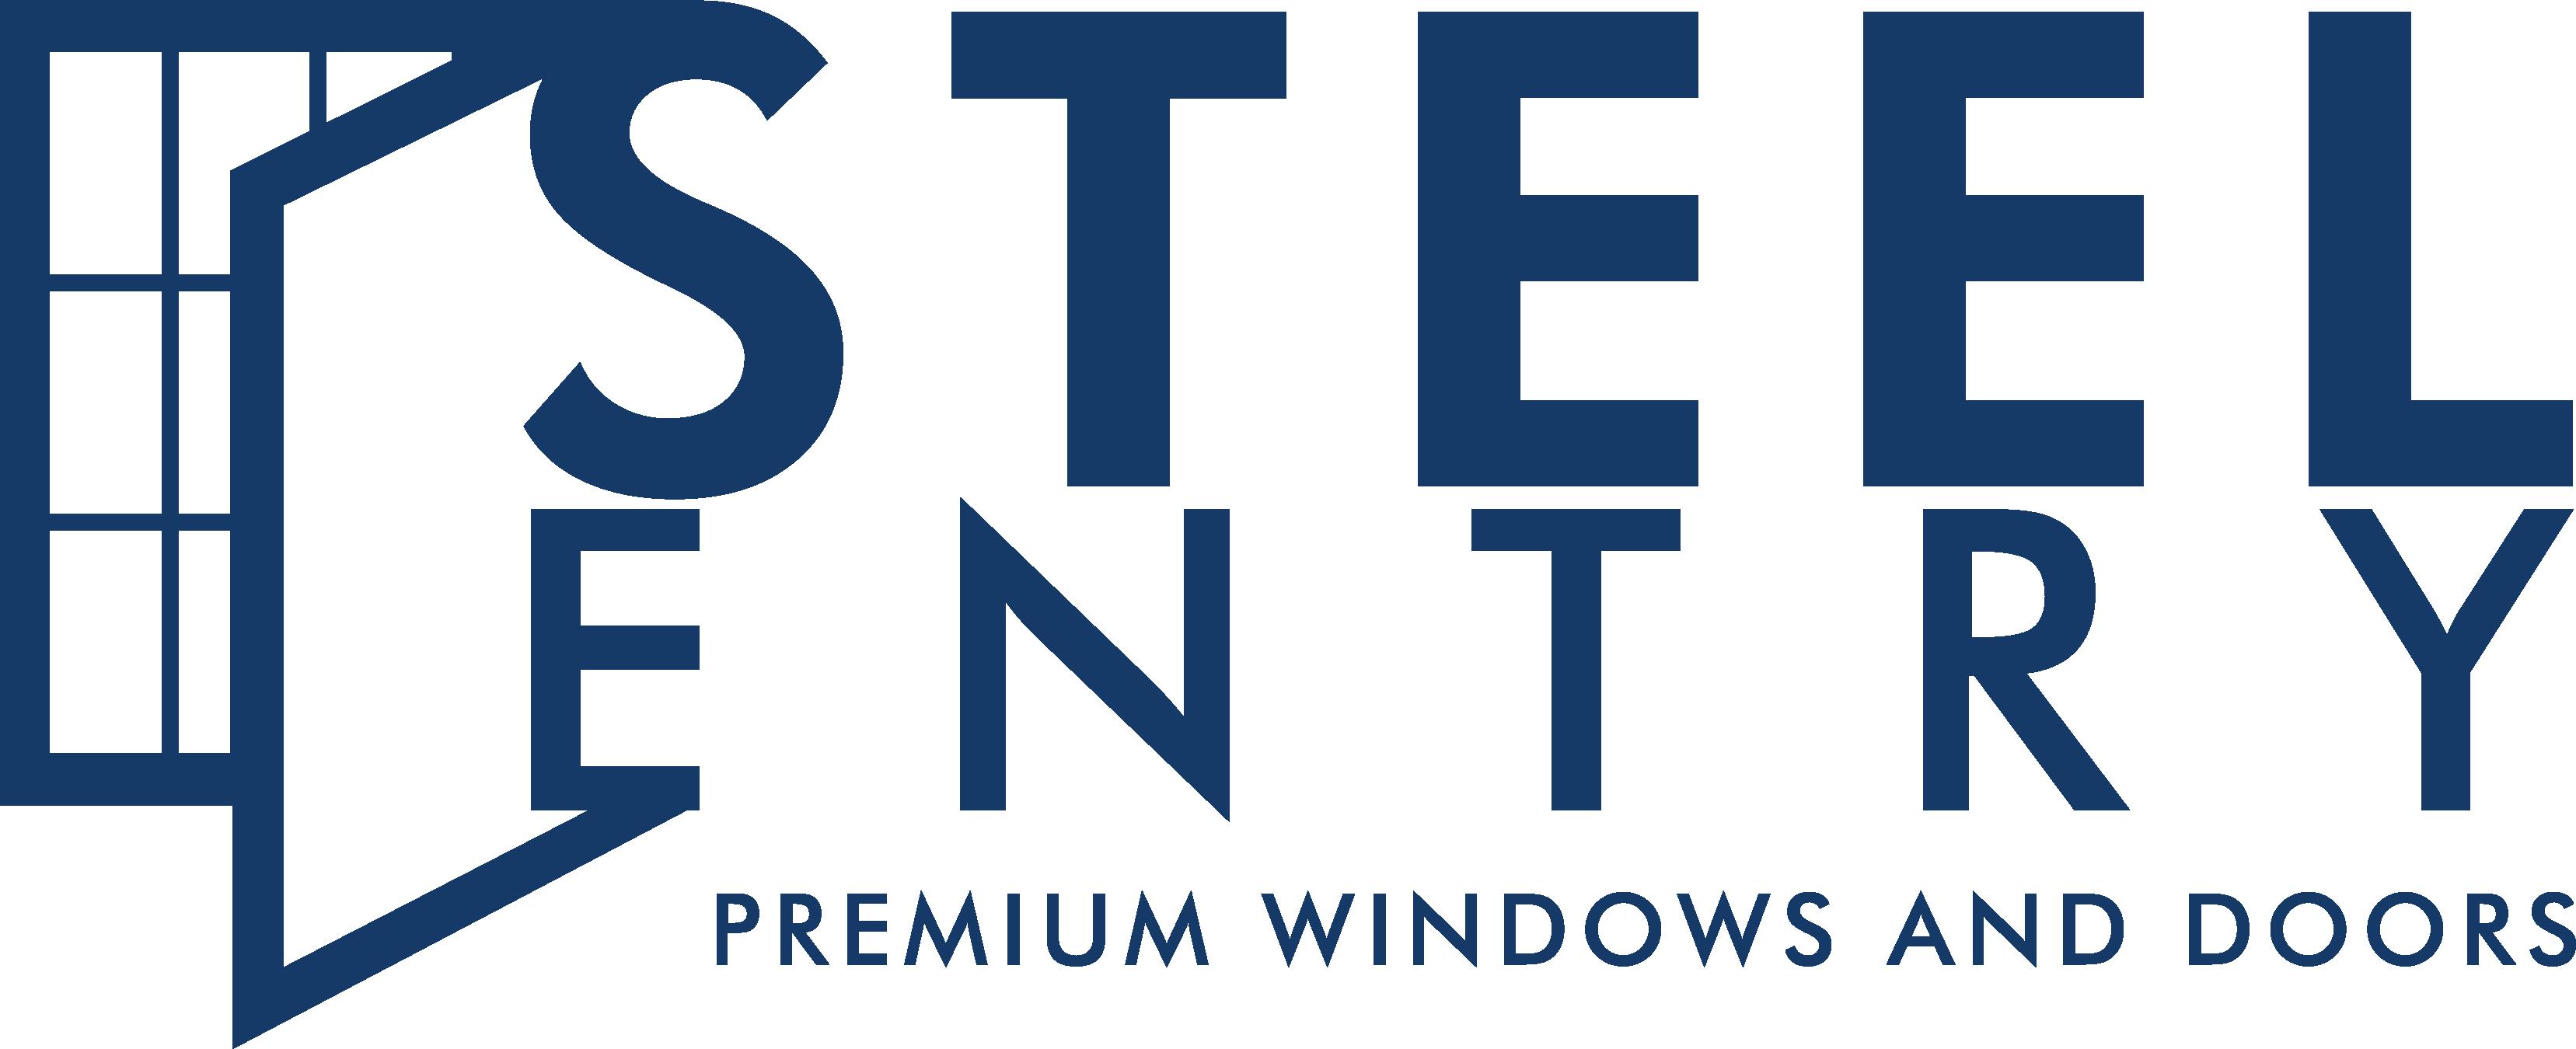 Steel Entry Premium Doors & Windows Logo